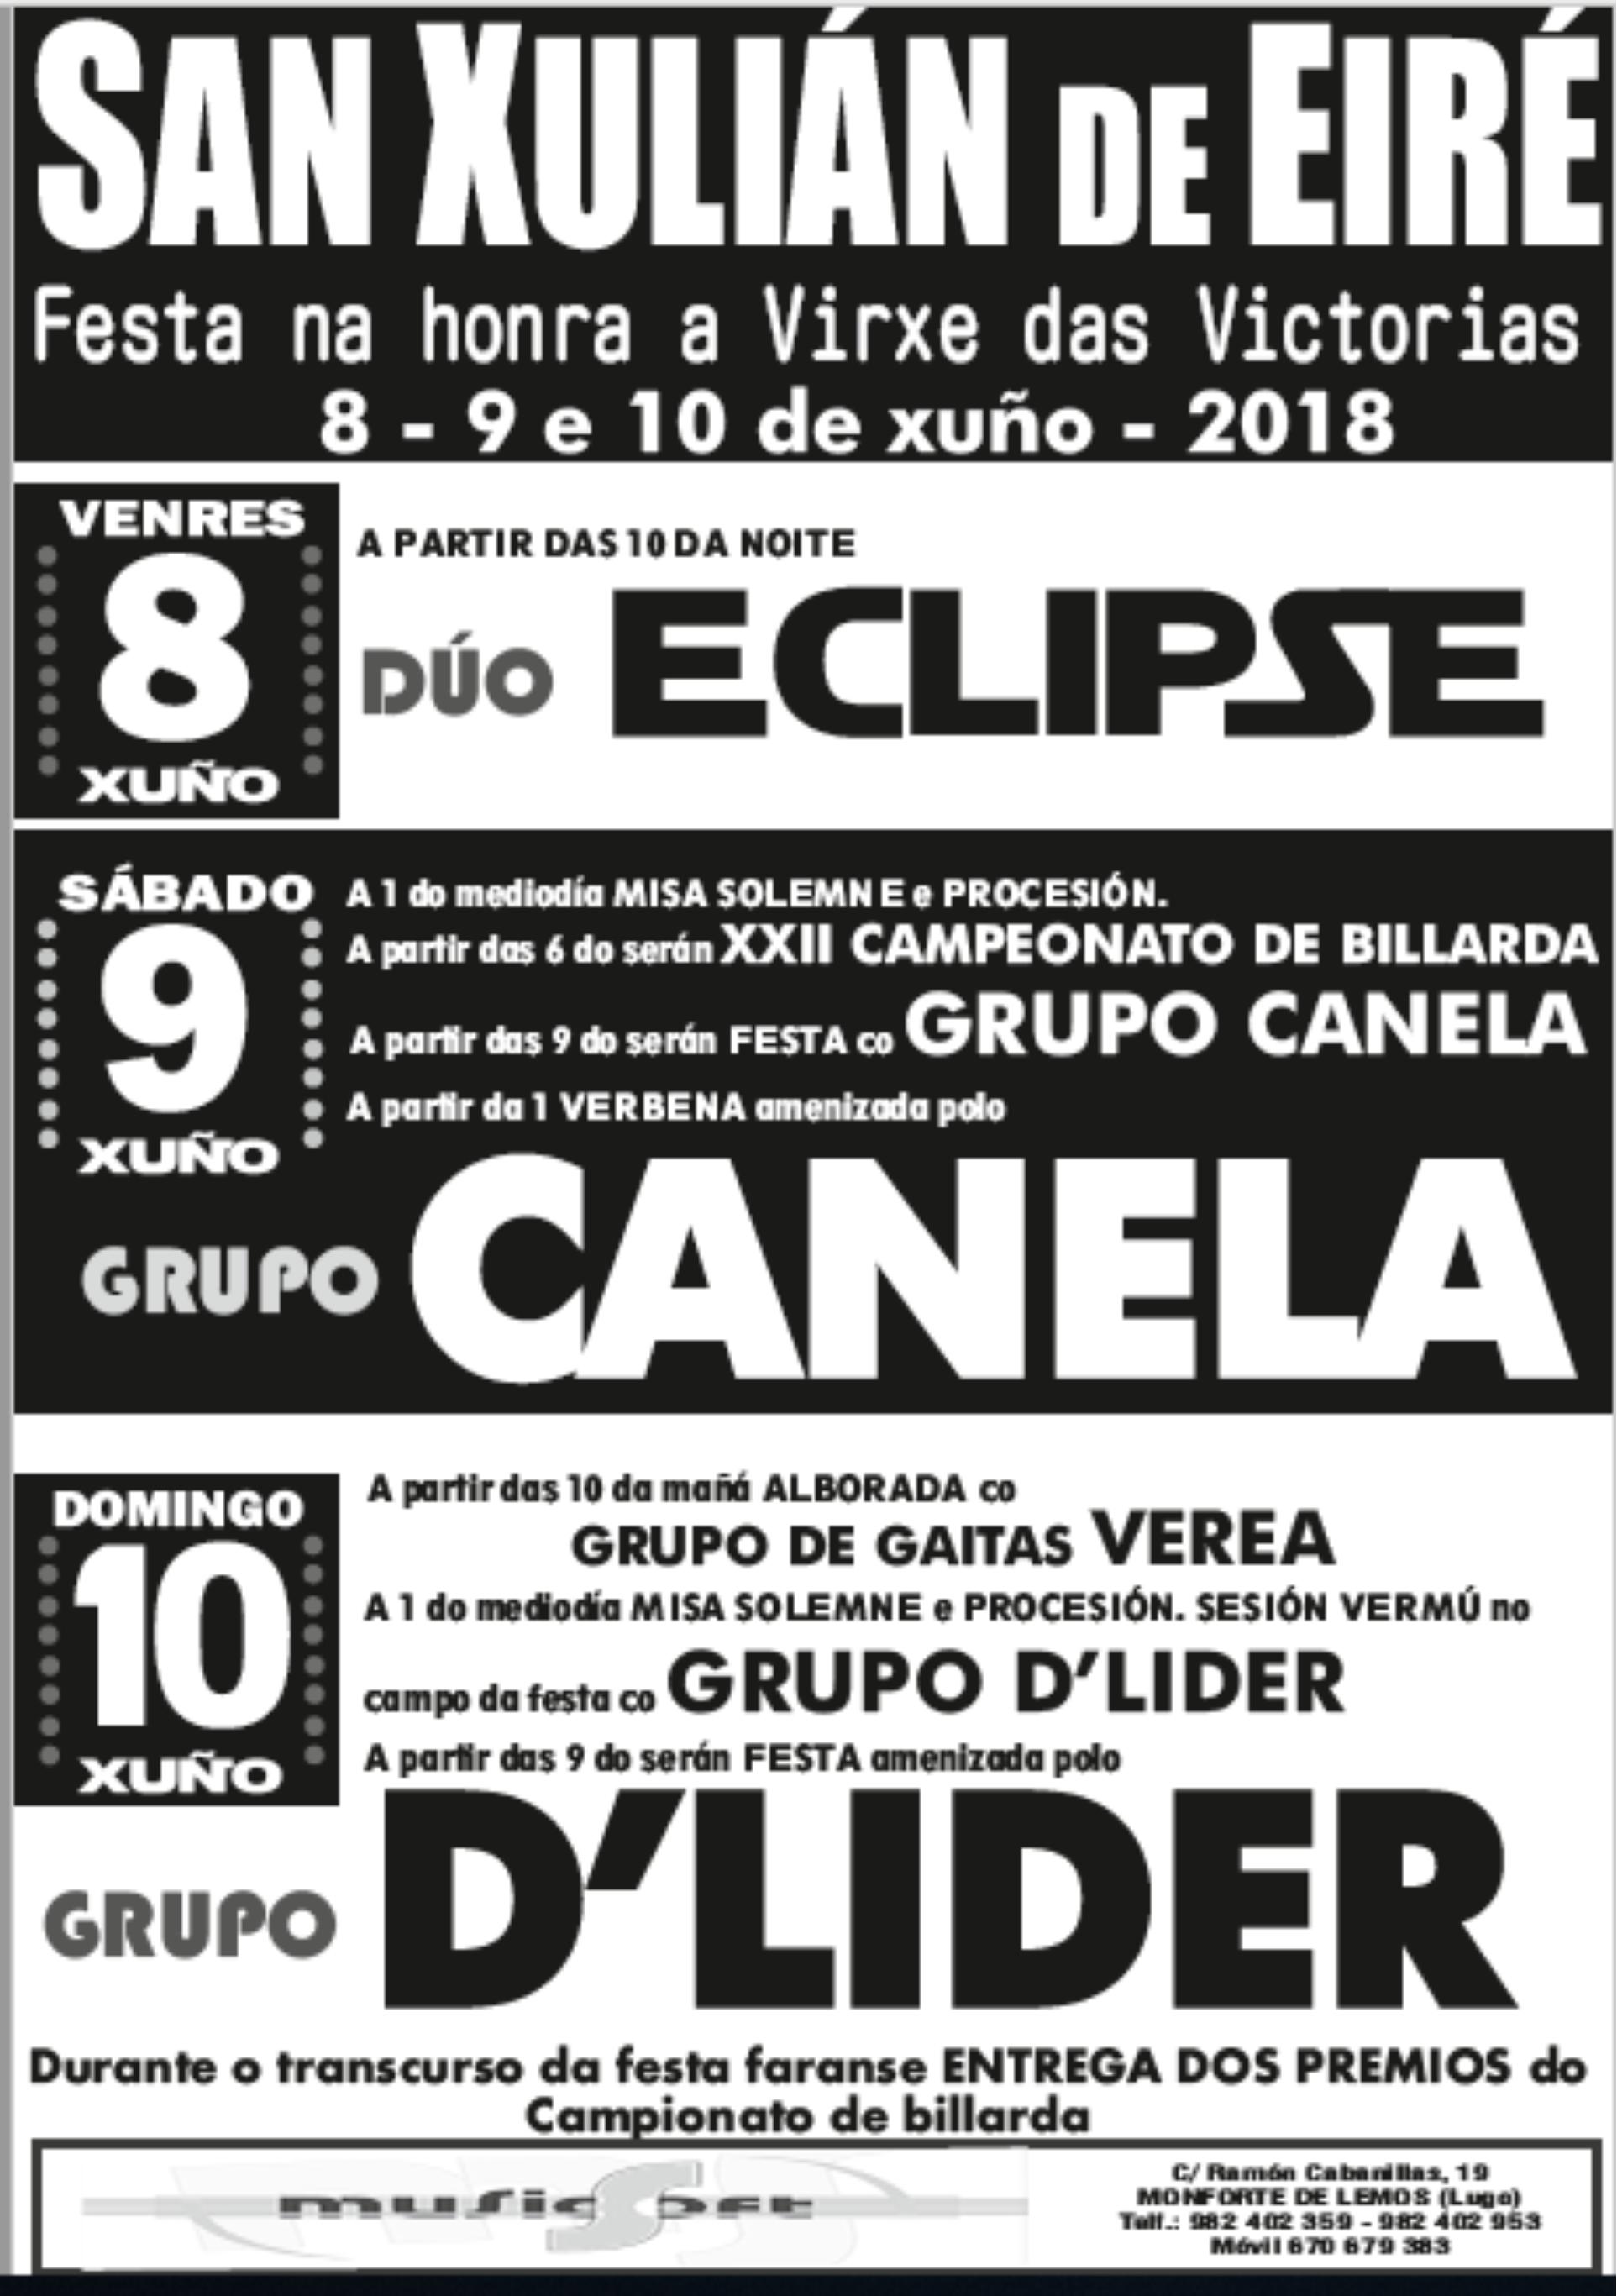 CARTEL FIESTAS SAN XULIAN DE EIRE 2018